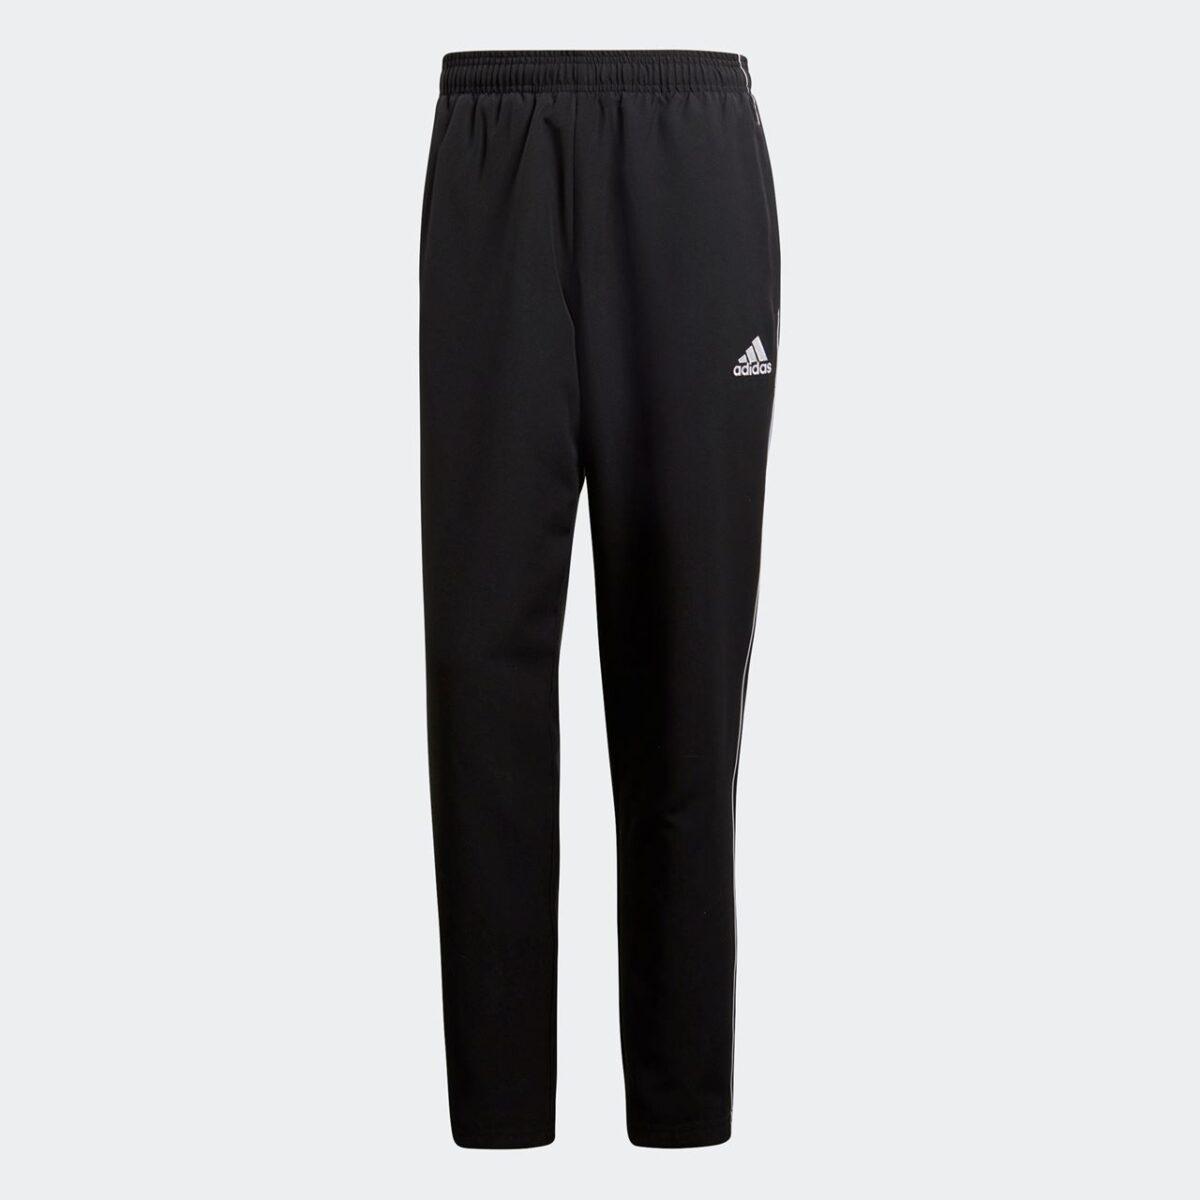 Adidas Core 18 Presentation Pant Adult